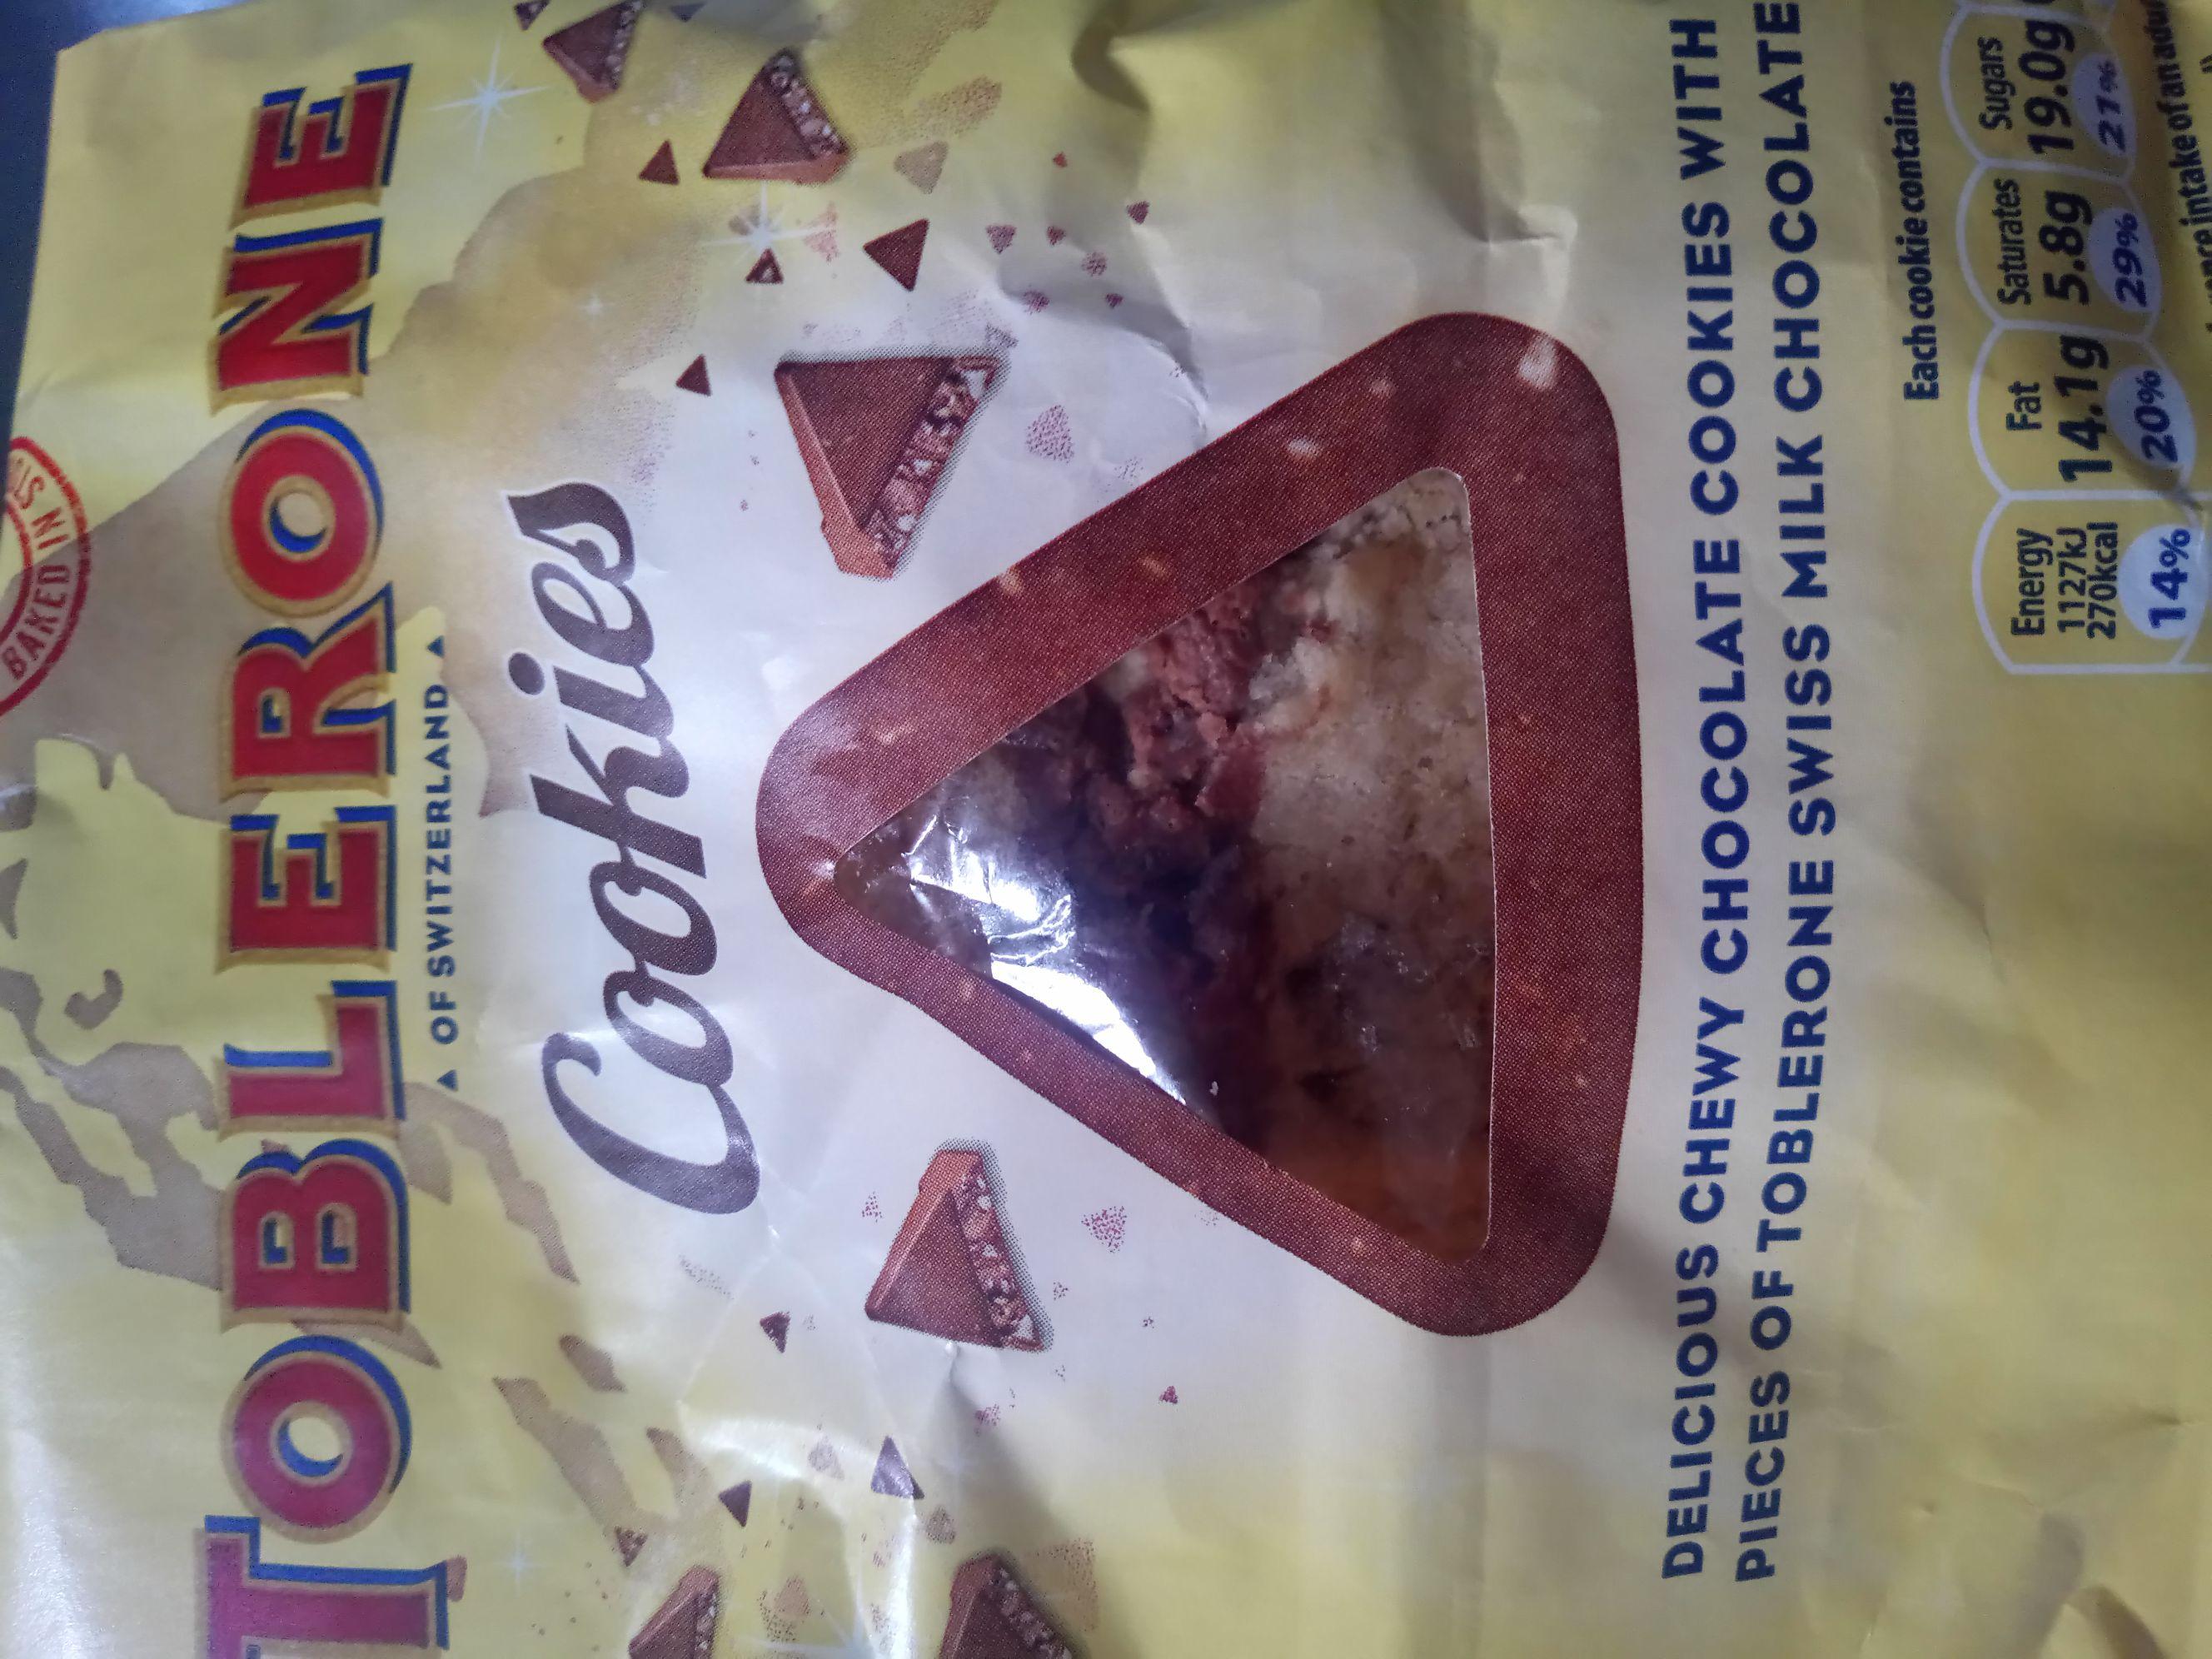 Asda Toblerone cookies  down to 50p instore